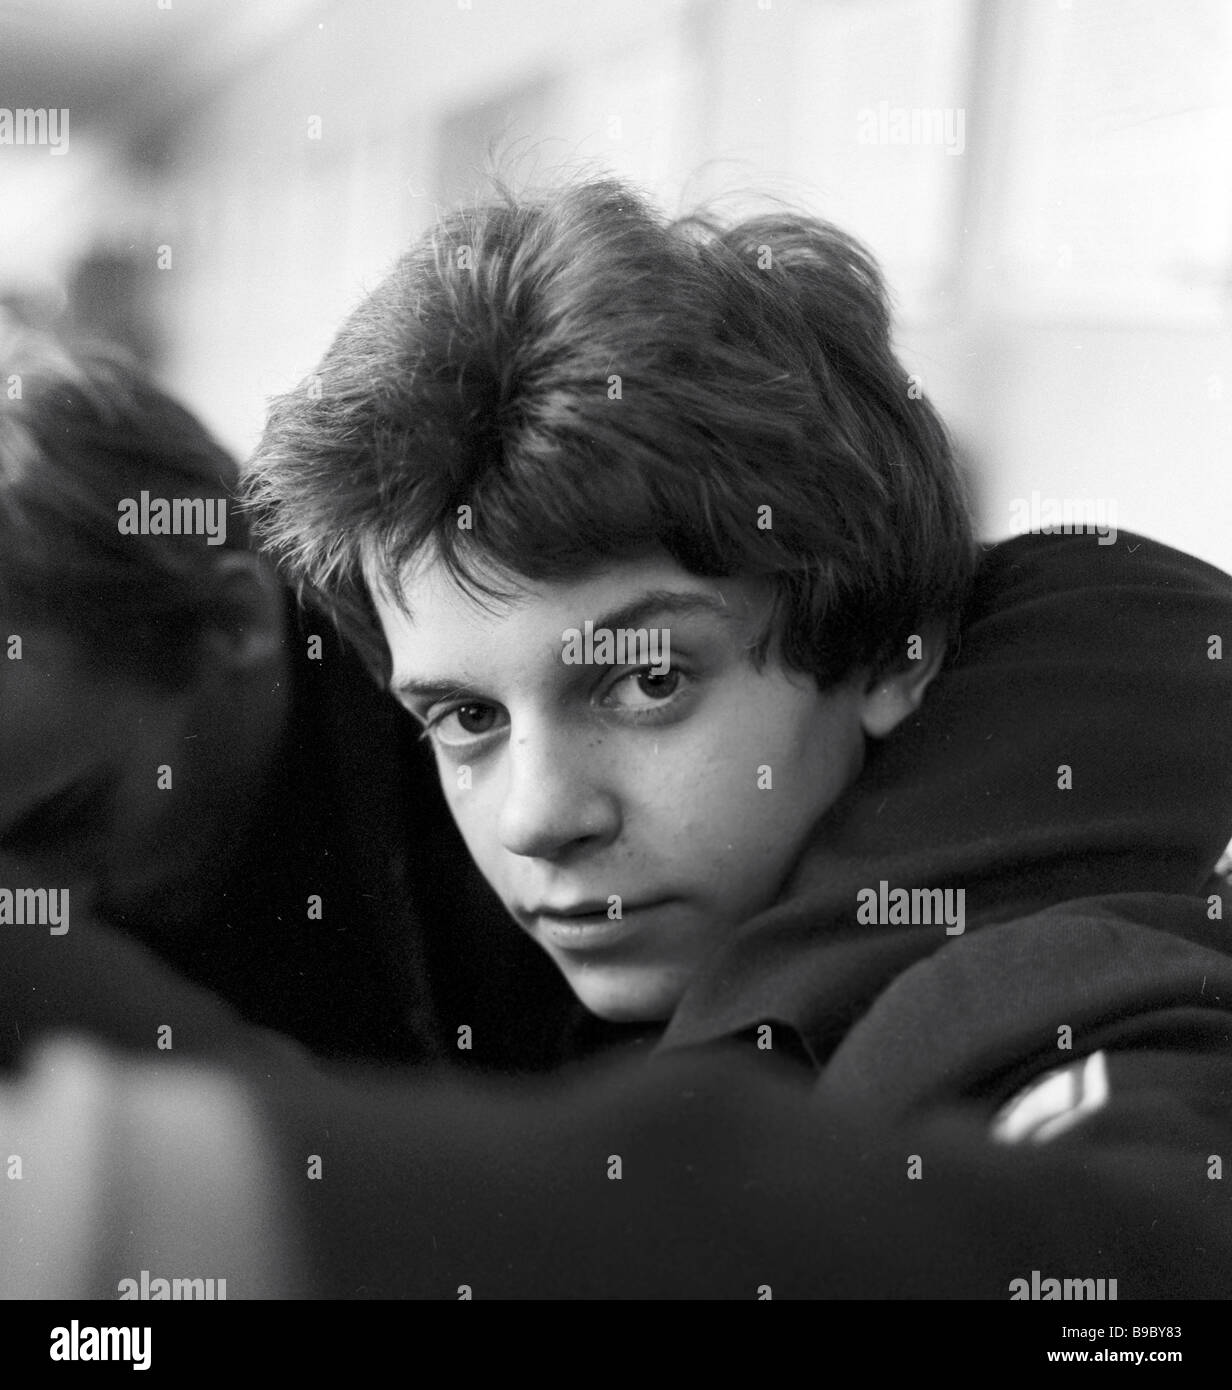 Vadim Abdrashitov: biography, filmography 88